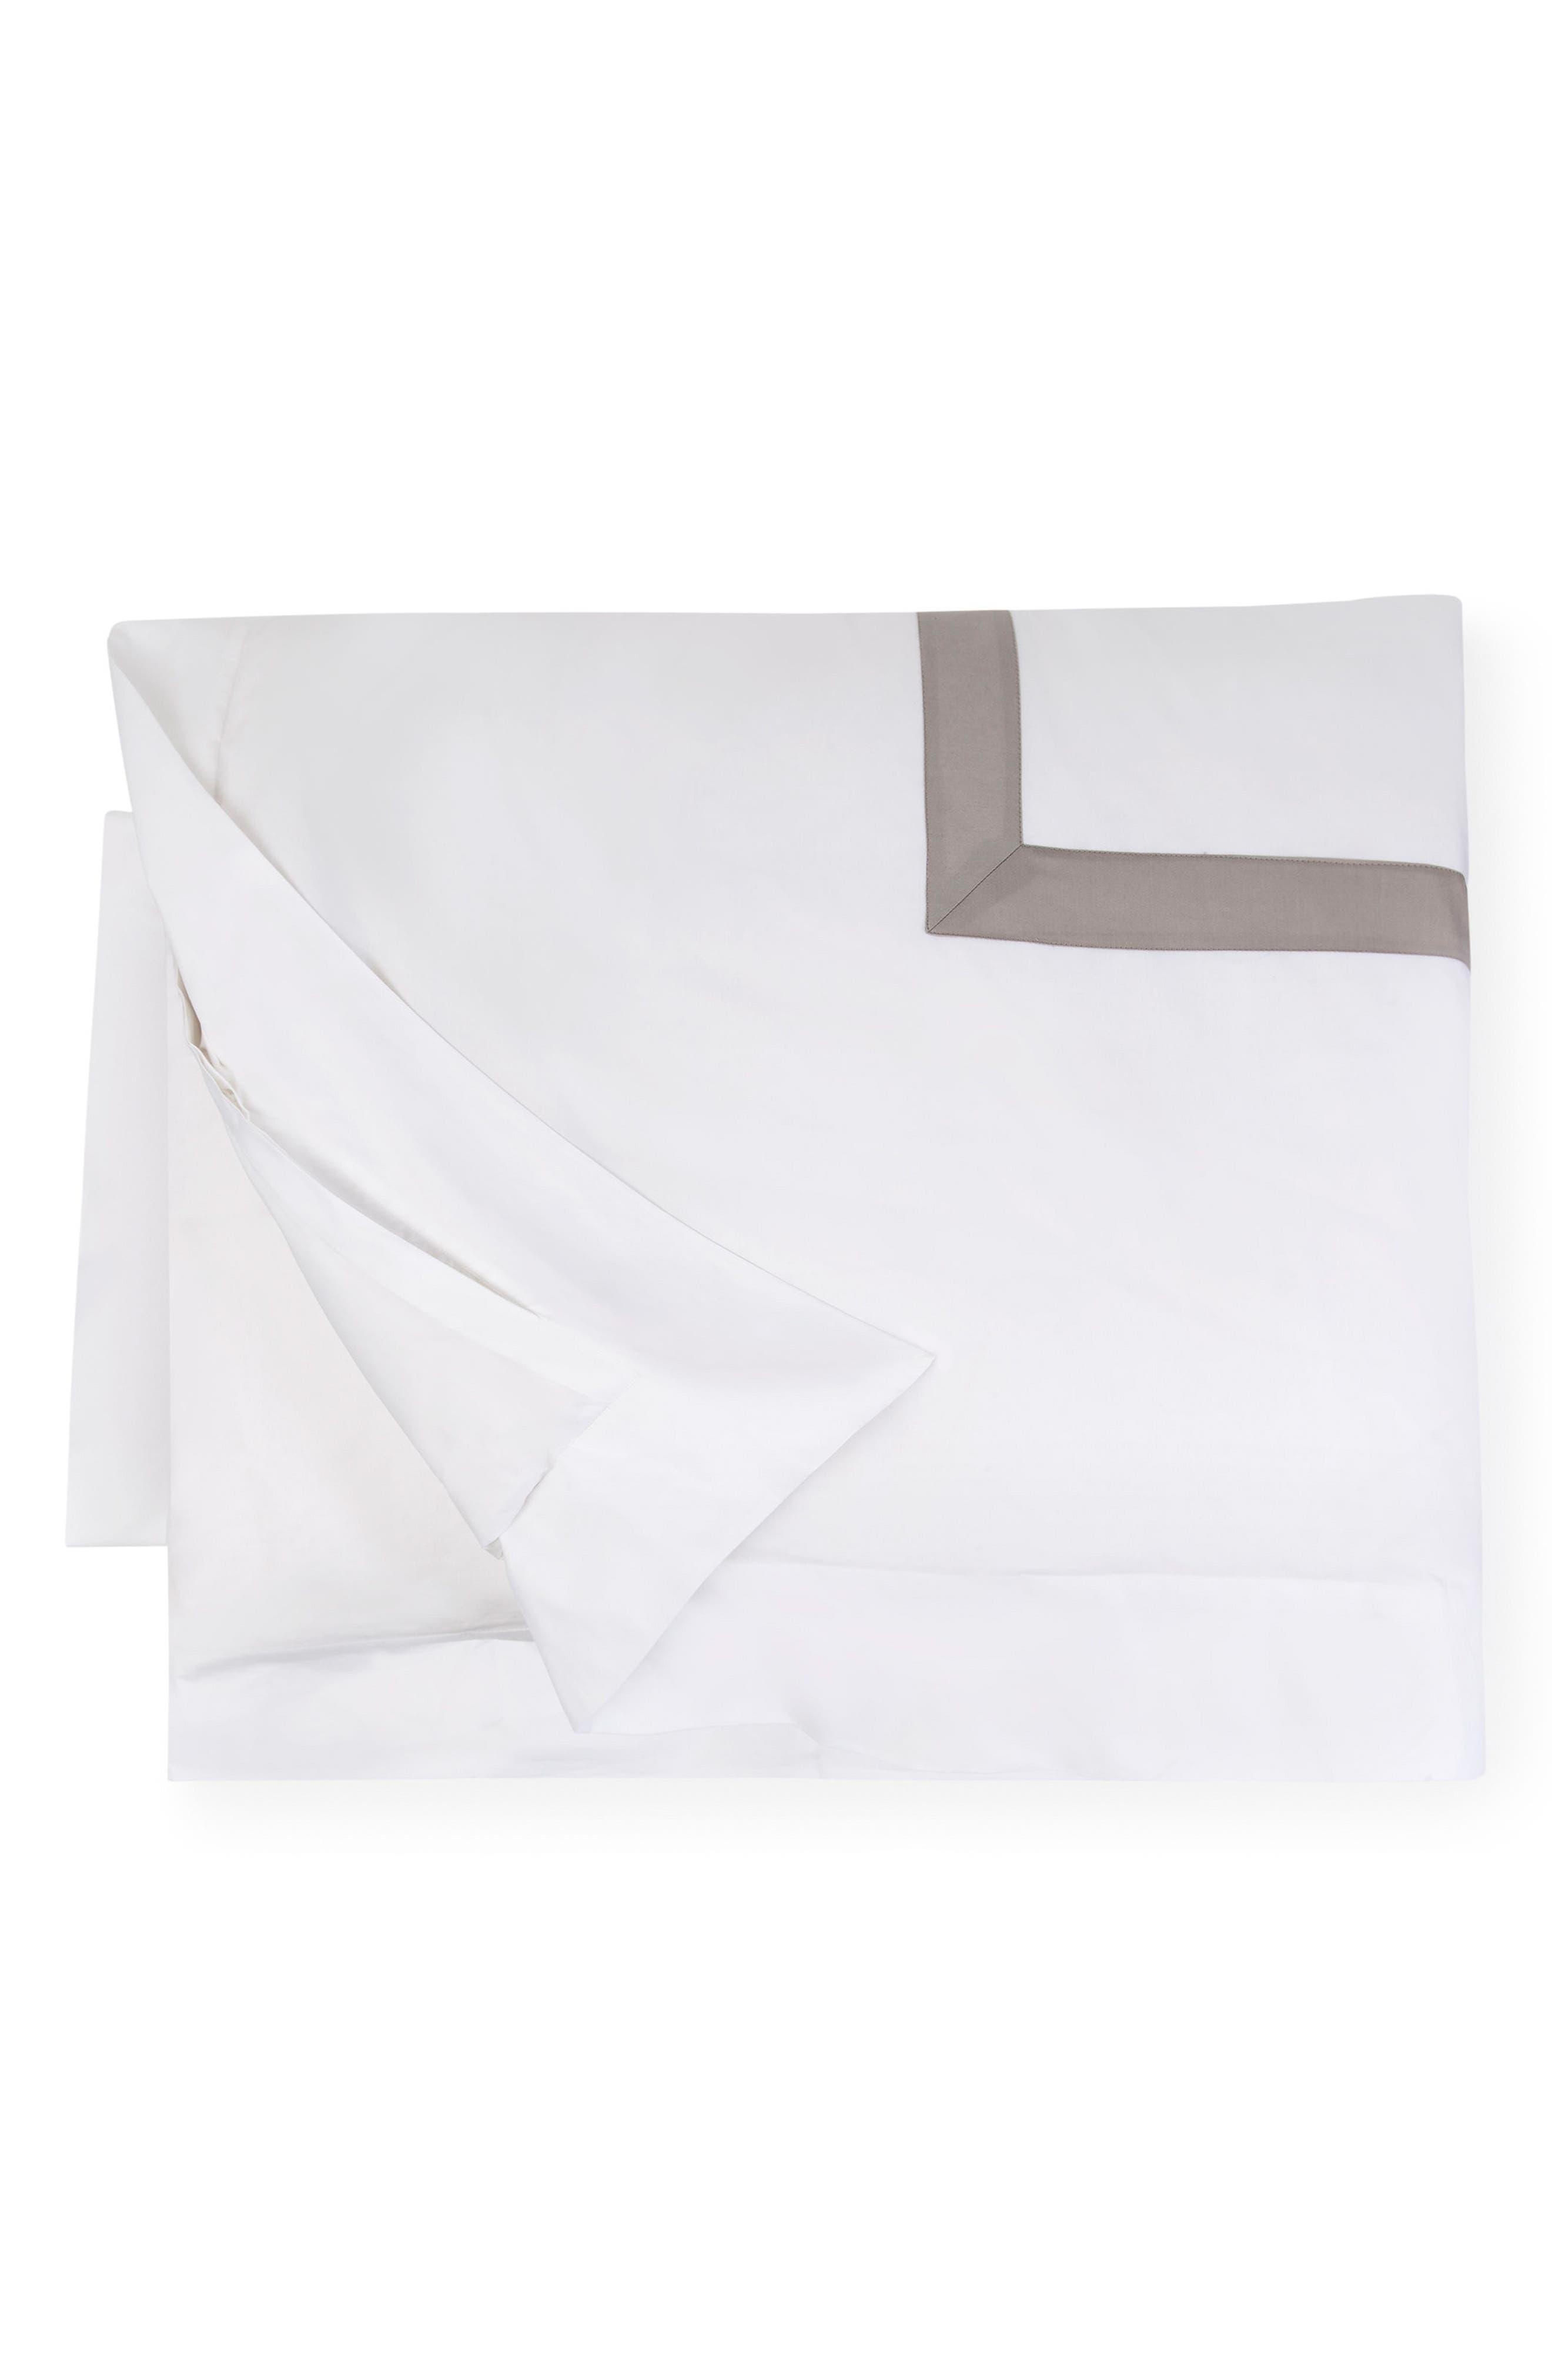 Orlo Duvet Cover,                         Main,                         color, WHITE/ GREY